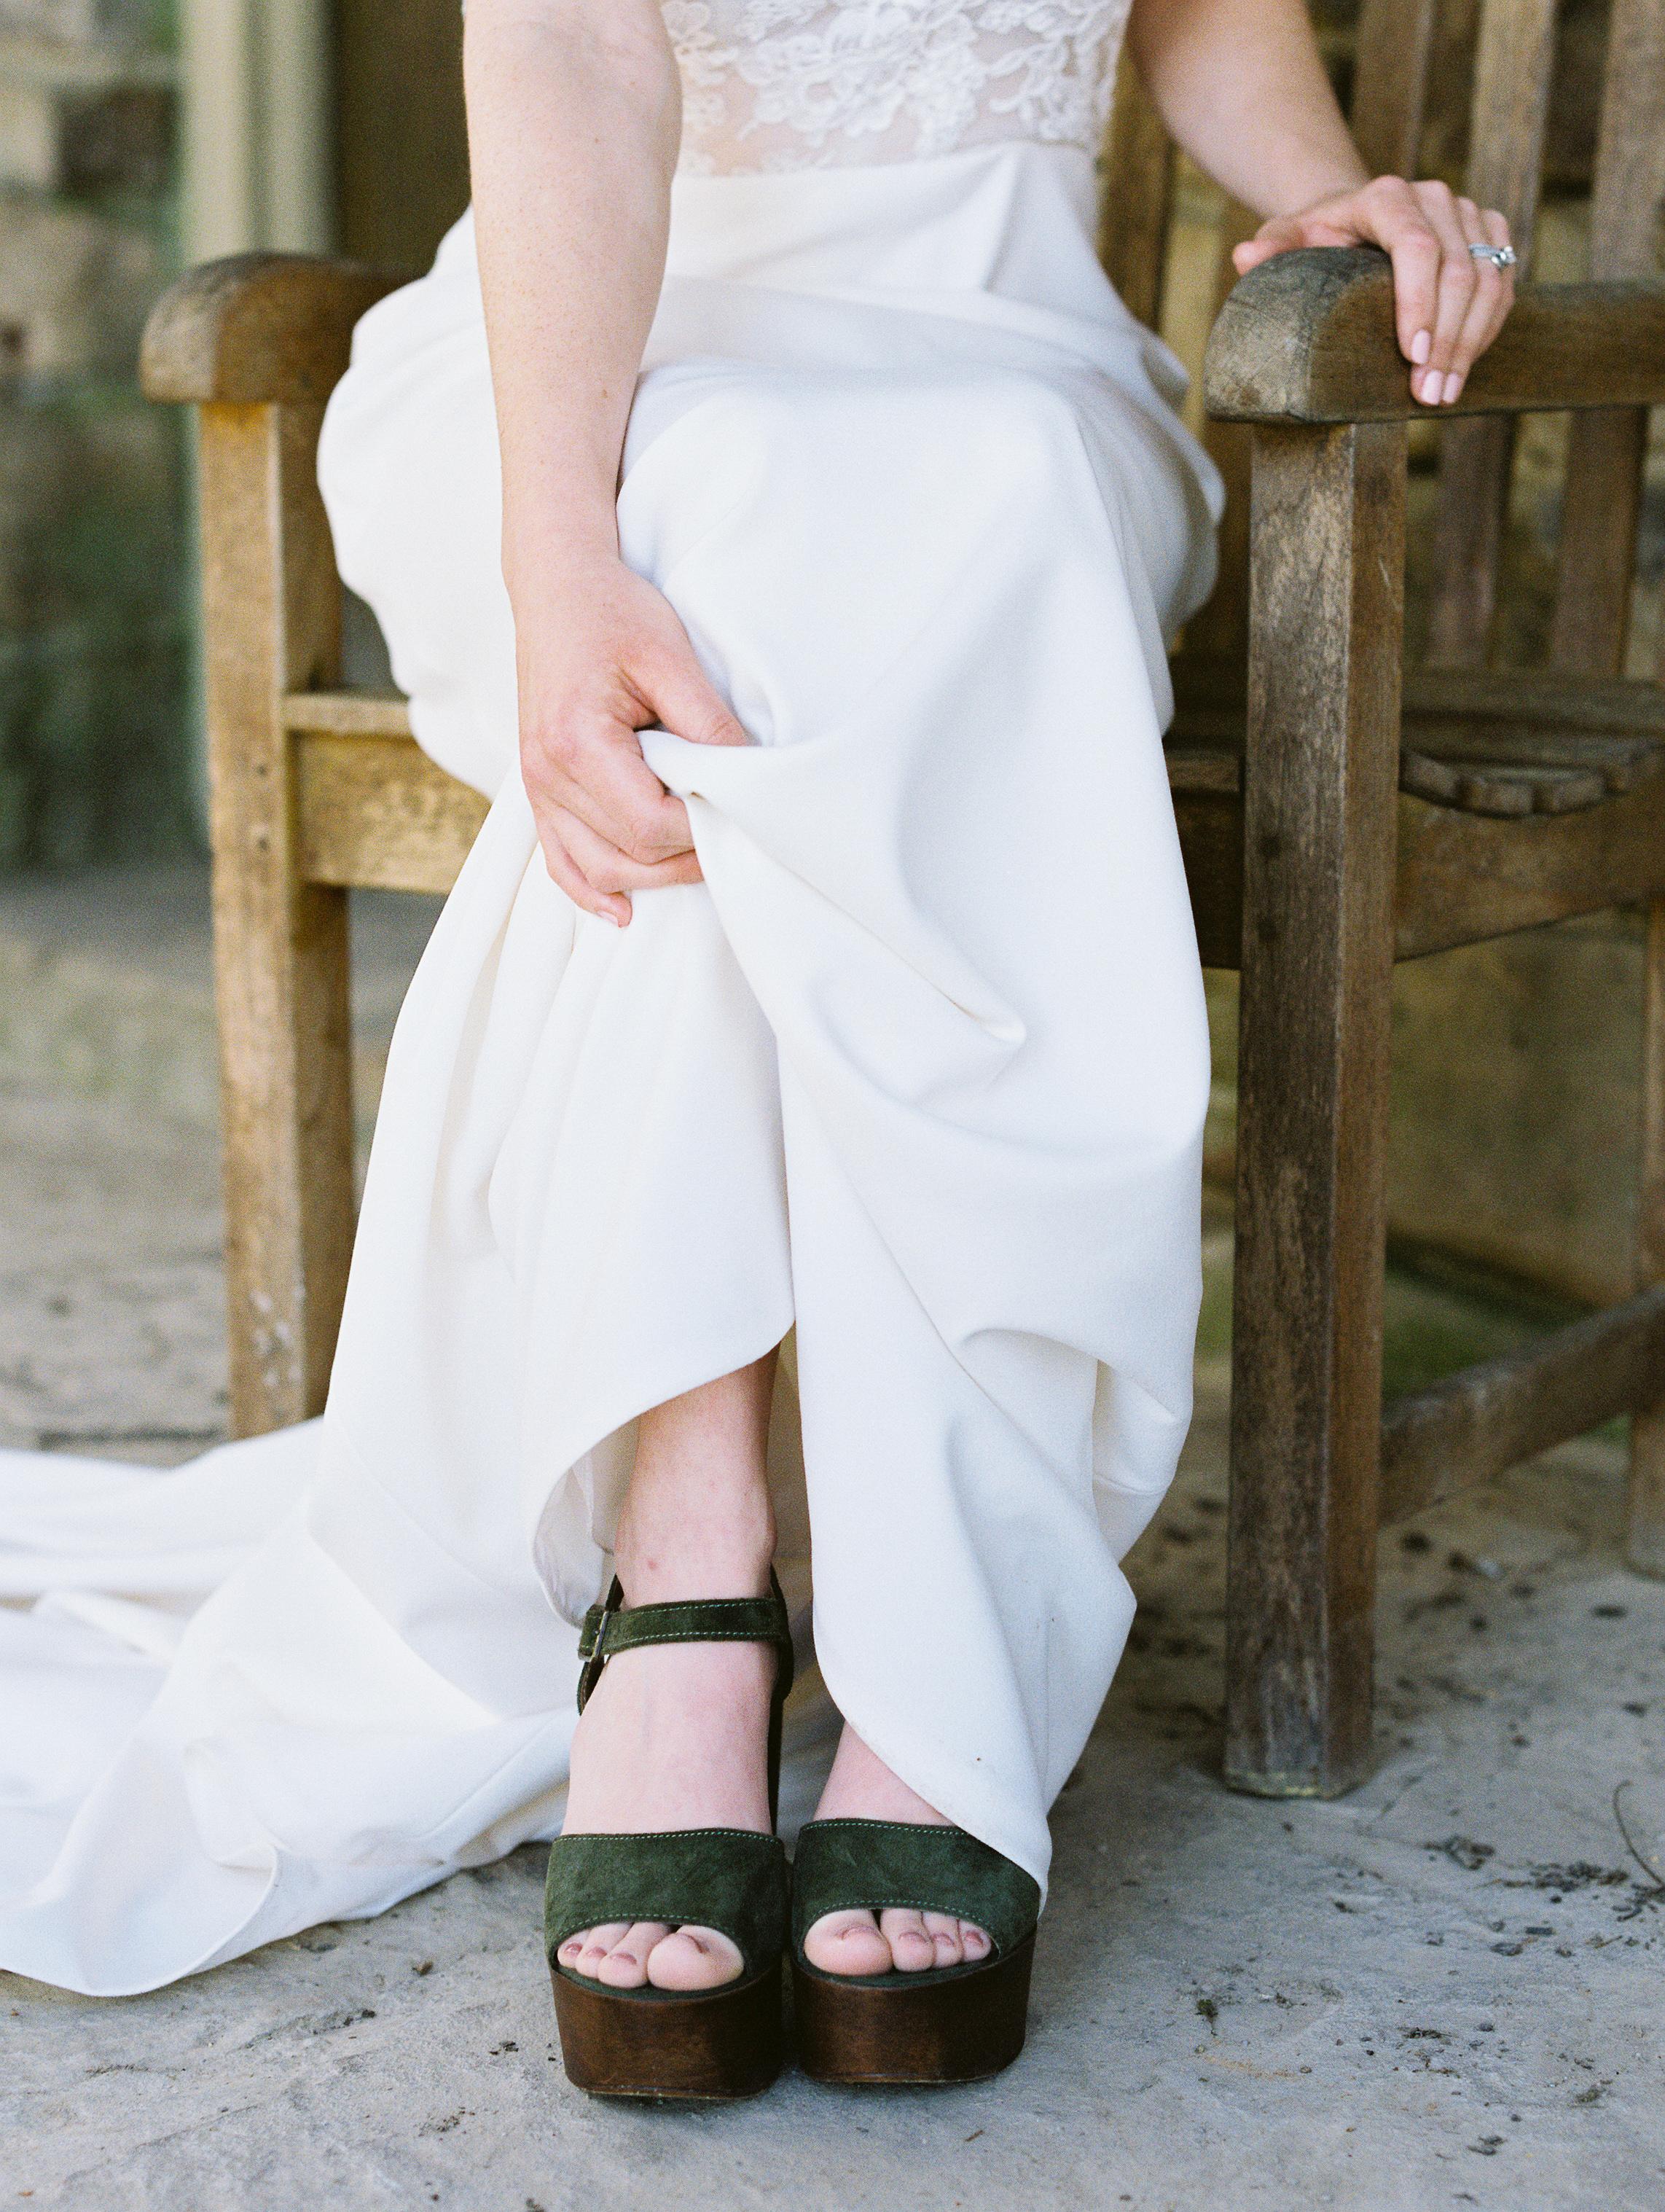 Huntsville-Alabama-Elopement-Intimate-Wedding-Film-Photographer-86.jpg